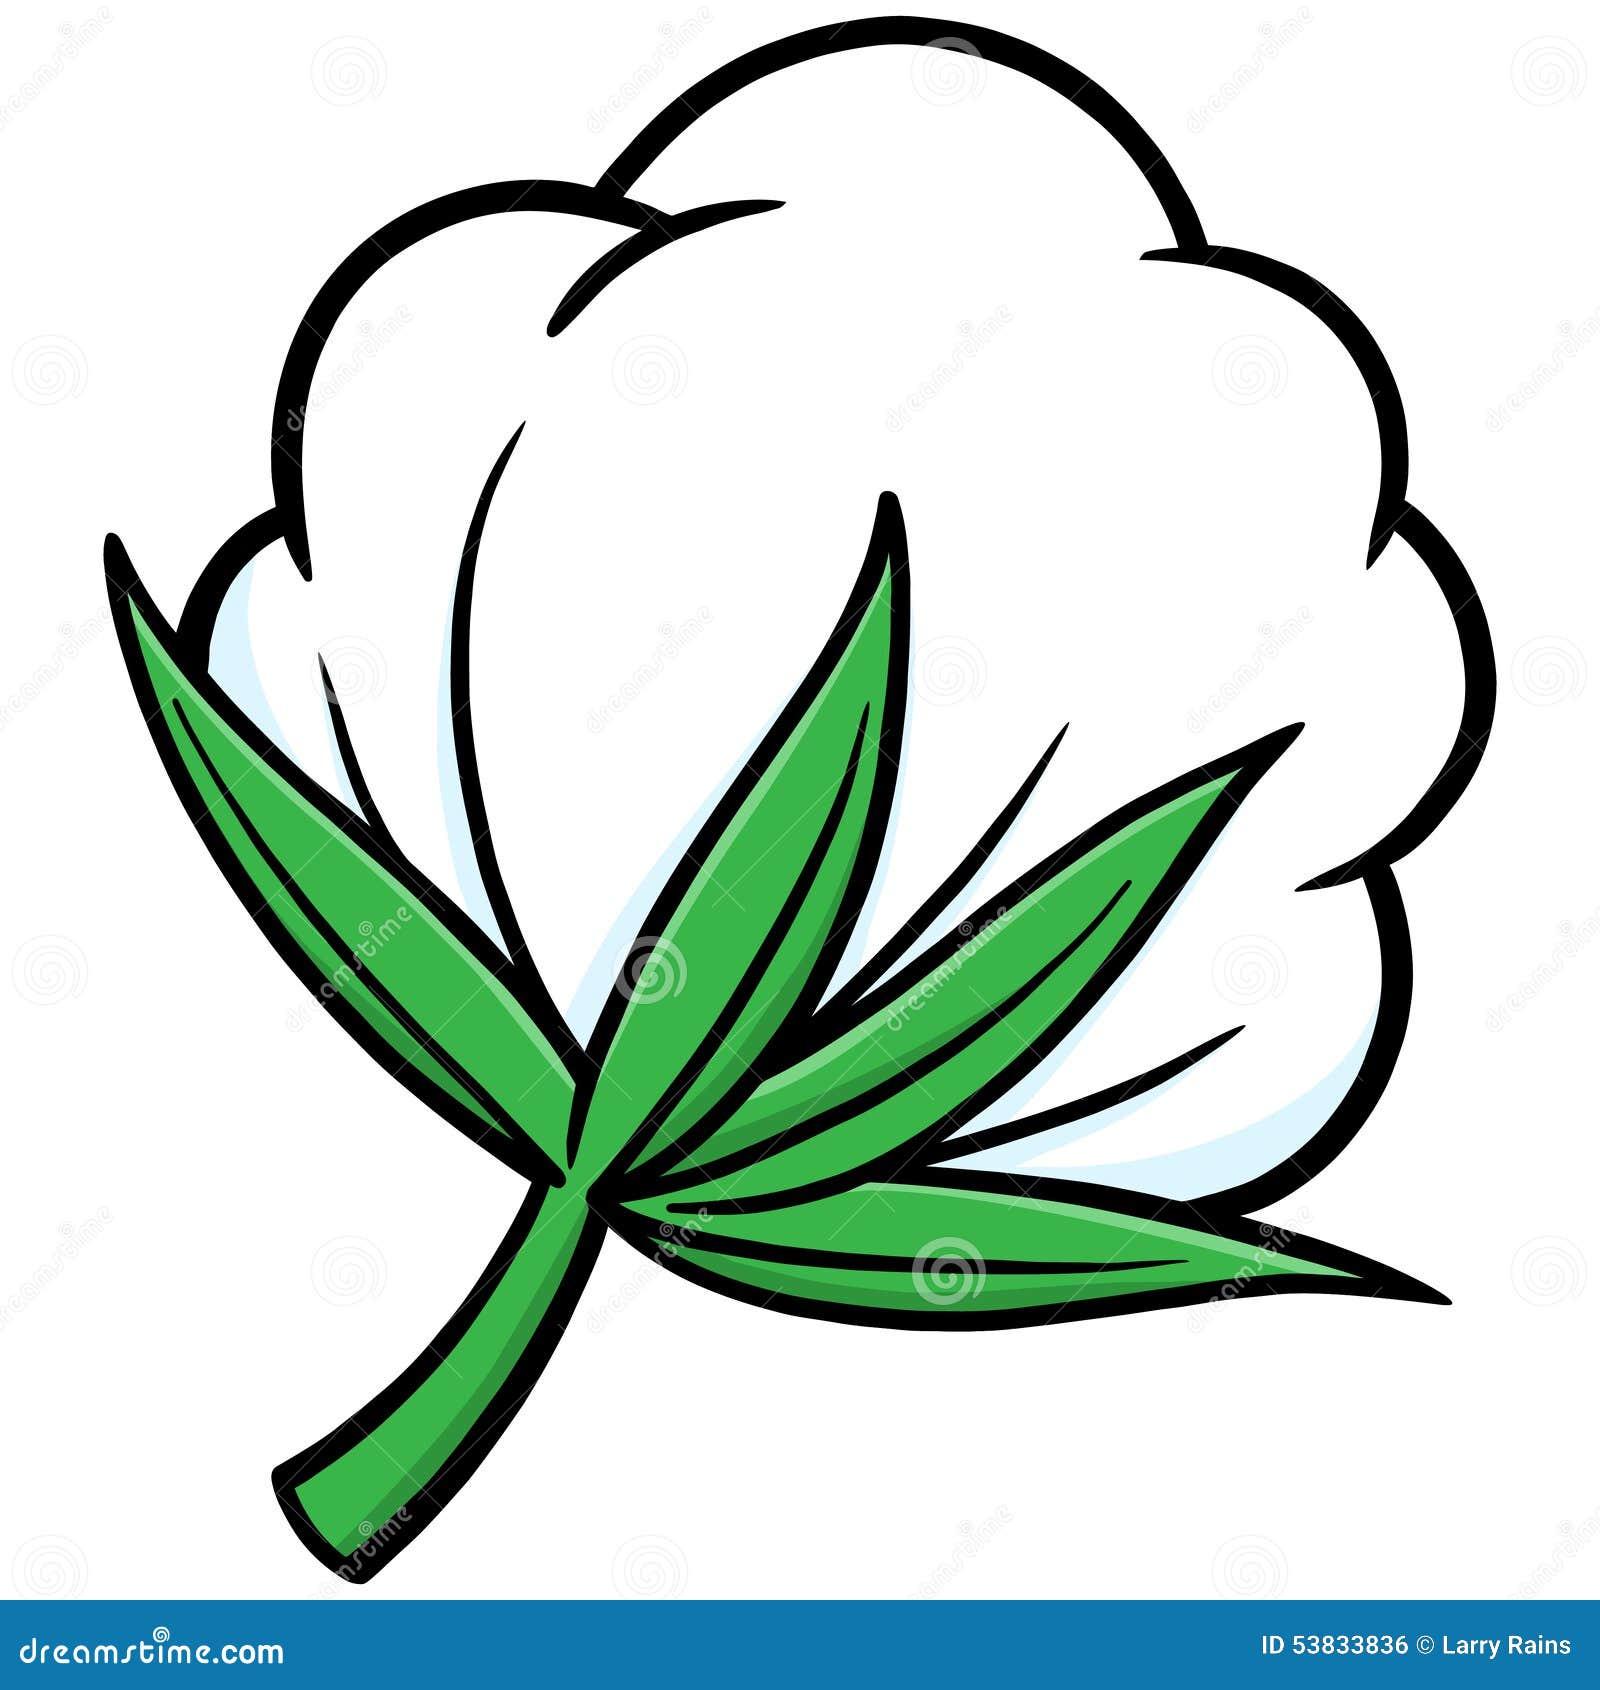 Cotton Stock Vector - Image: 53833836